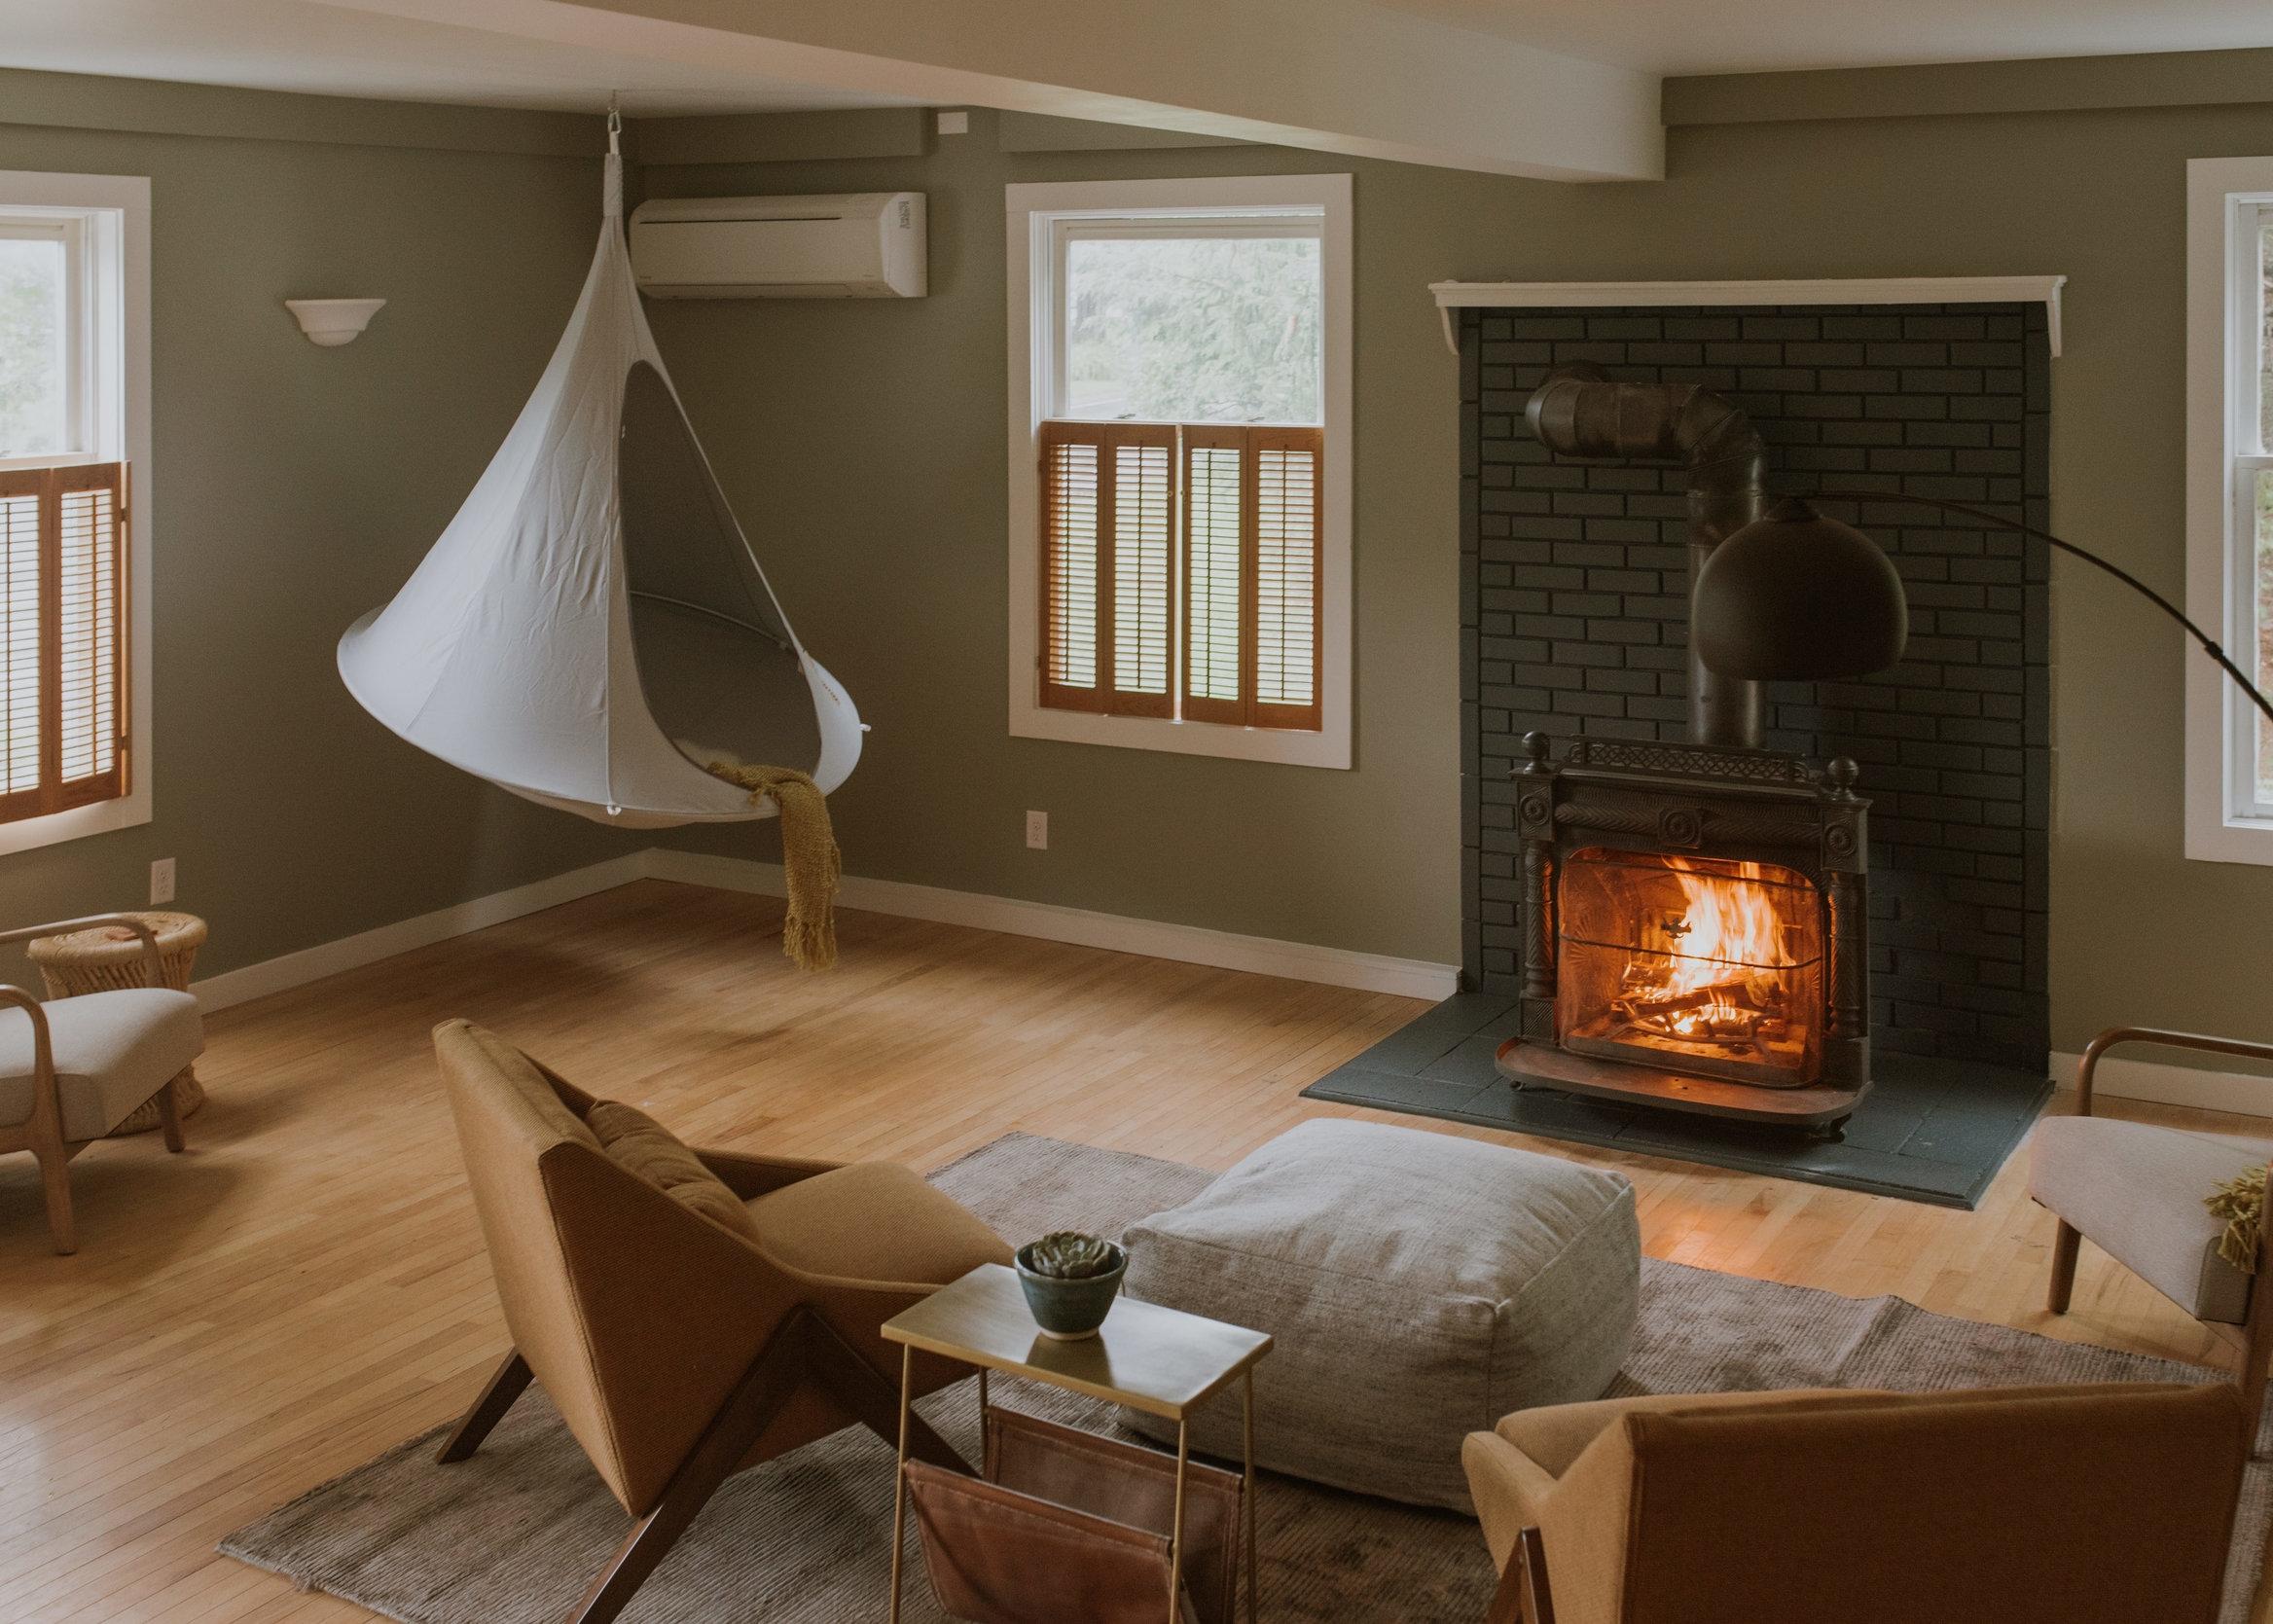 arnold-house-summer-Lawrence-Braun-SPA-0003.jpg